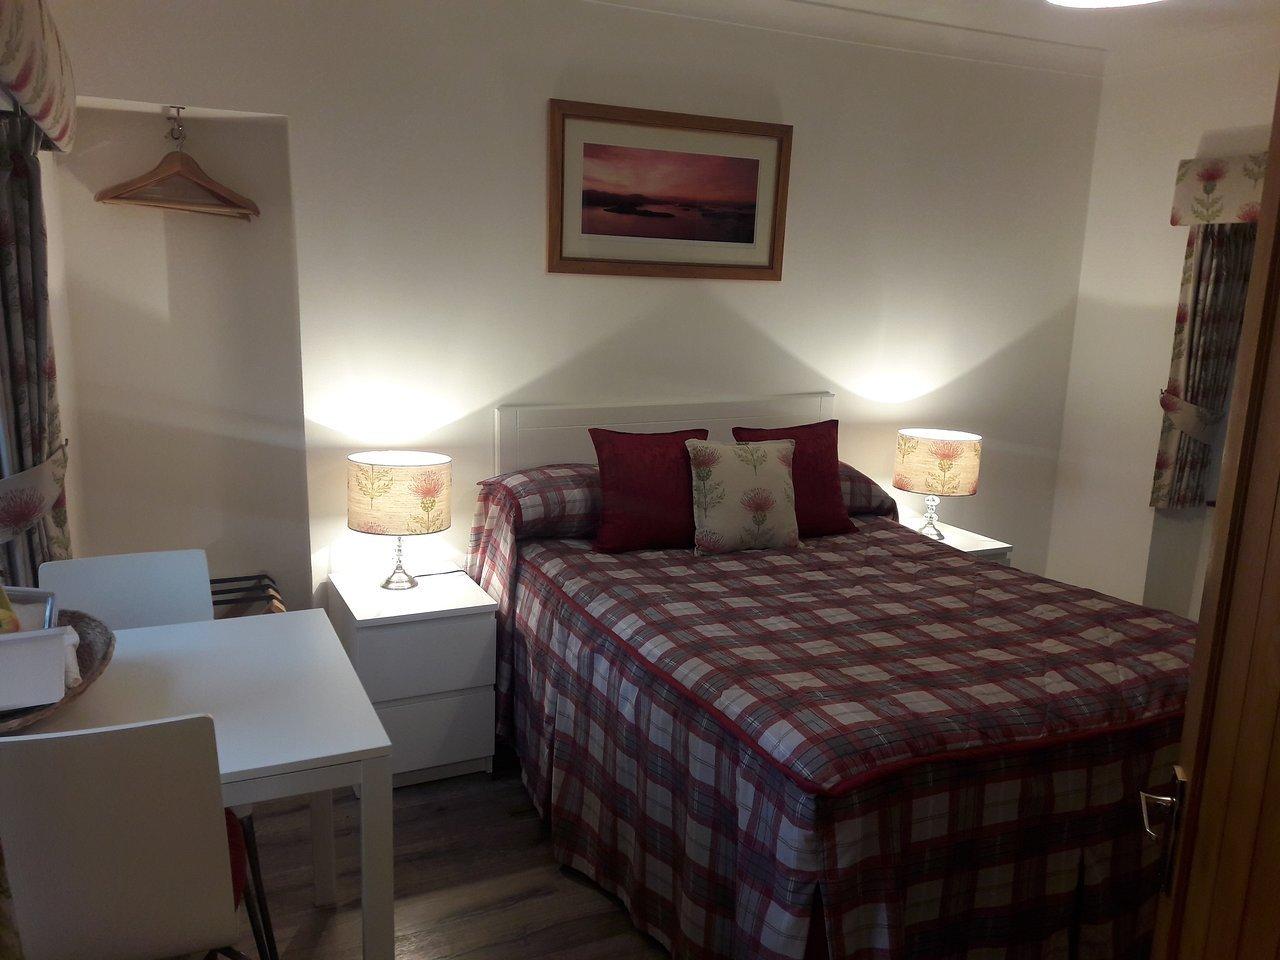 Pier One Bedroom Set Lovely Alderdale Bed & Breakfast Rooms & Reviews